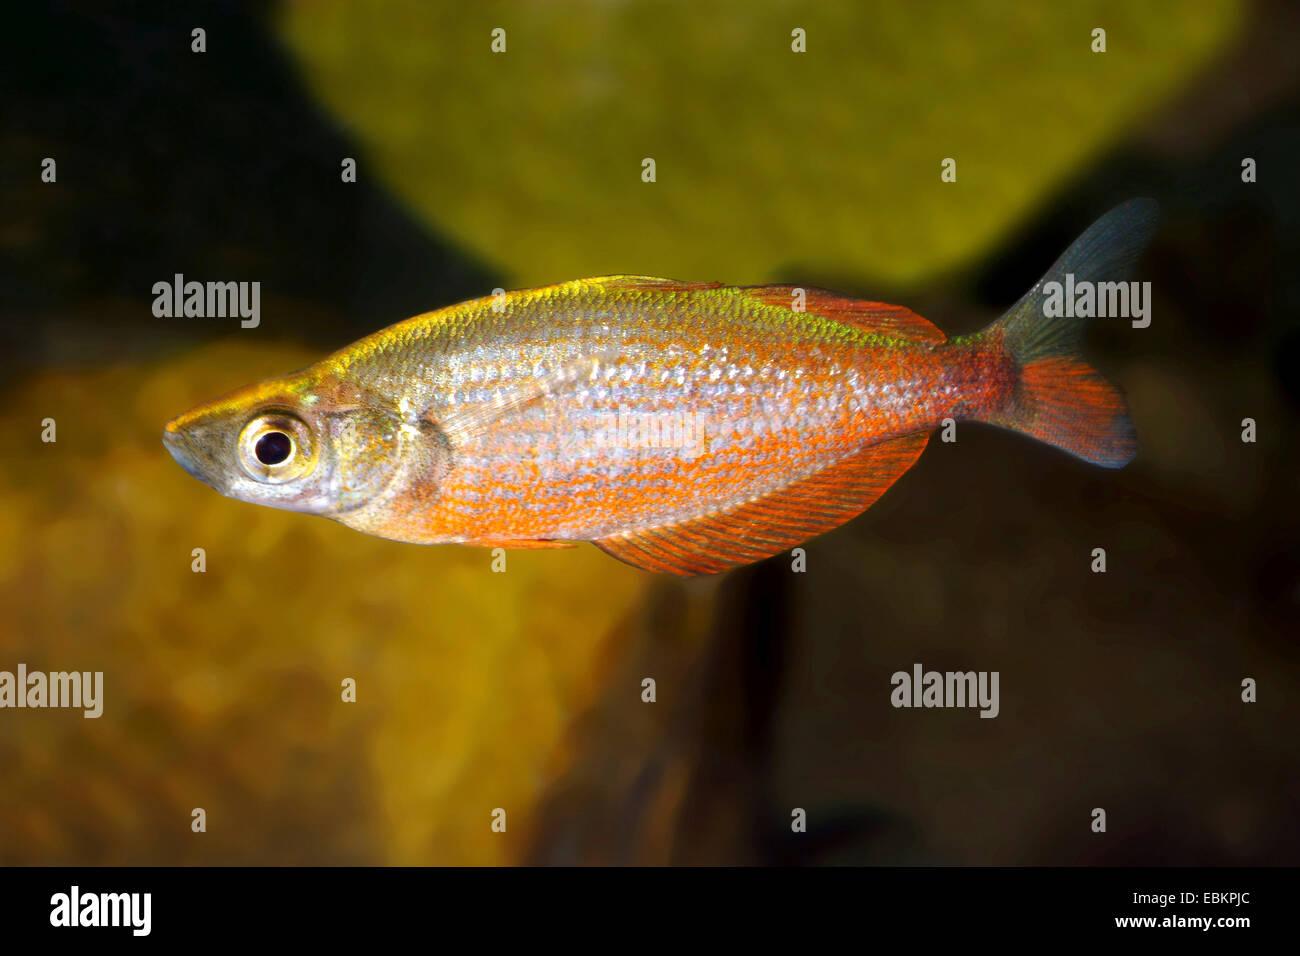 Tami River Rainbowfish (Glossolepis pseudoincisus), female - Stock Image